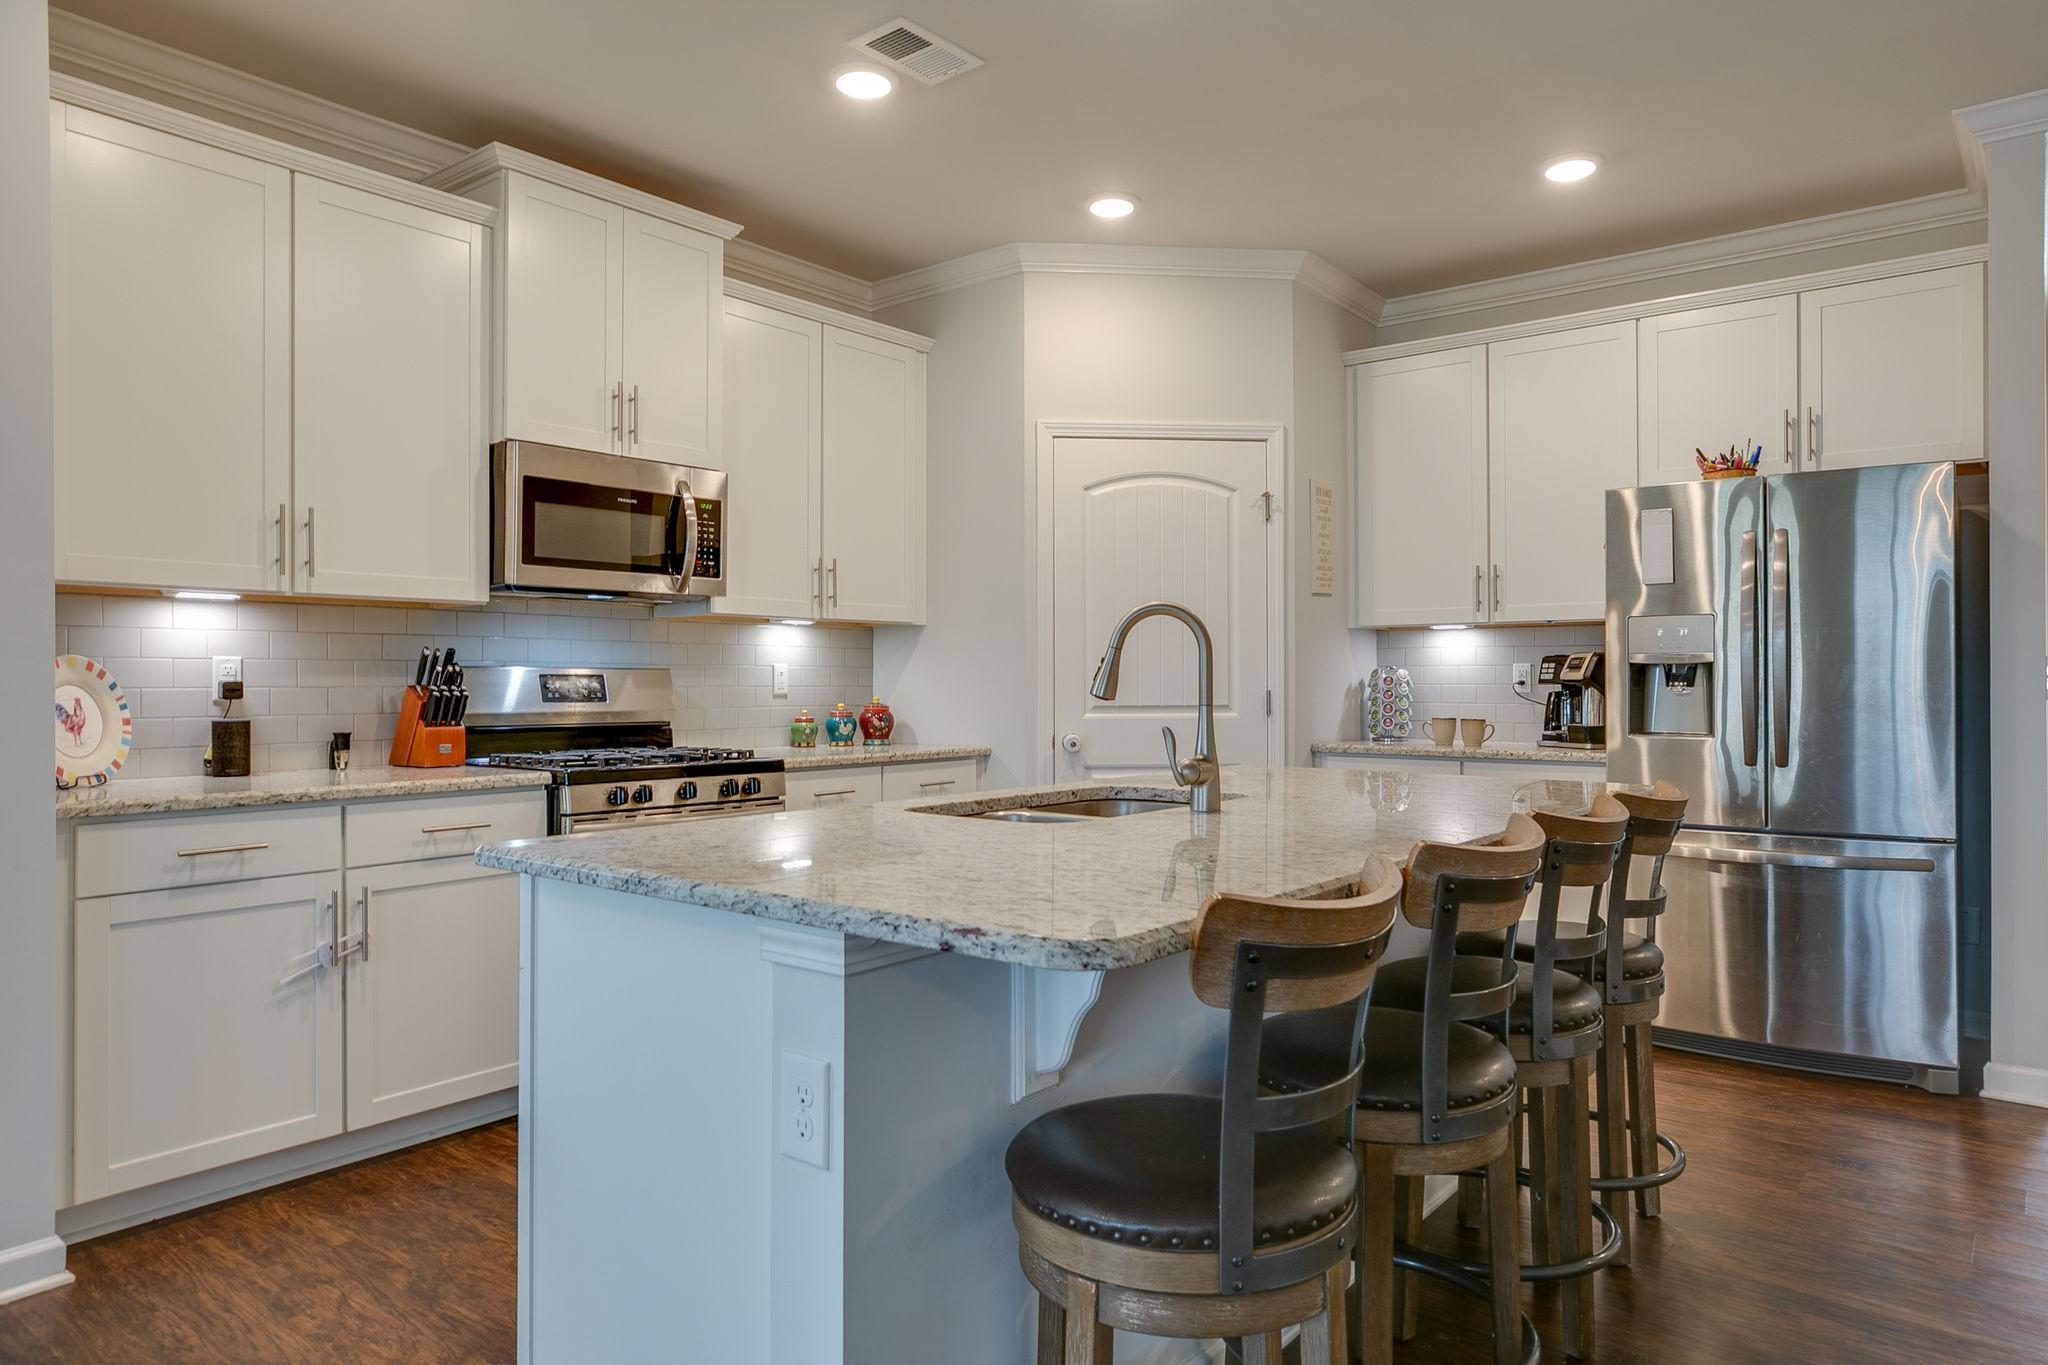 334 William Dylan Dr, Murfreesboro, TN 37129 - Murfreesboro, TN real estate listing